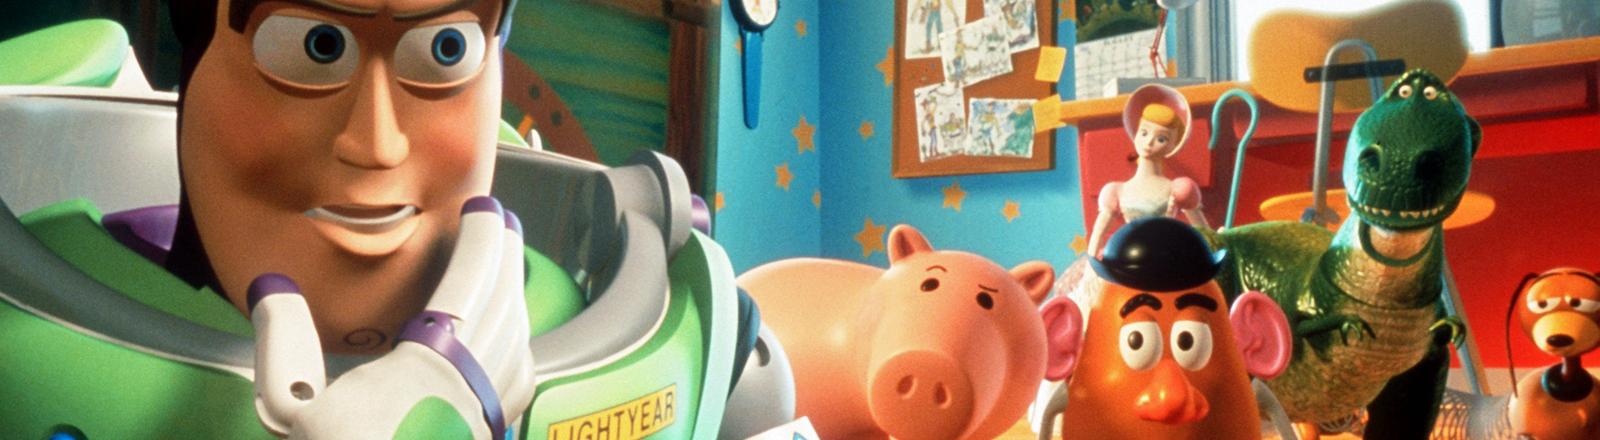 Eine Szene aus dem Pixar-Film Toy Story.